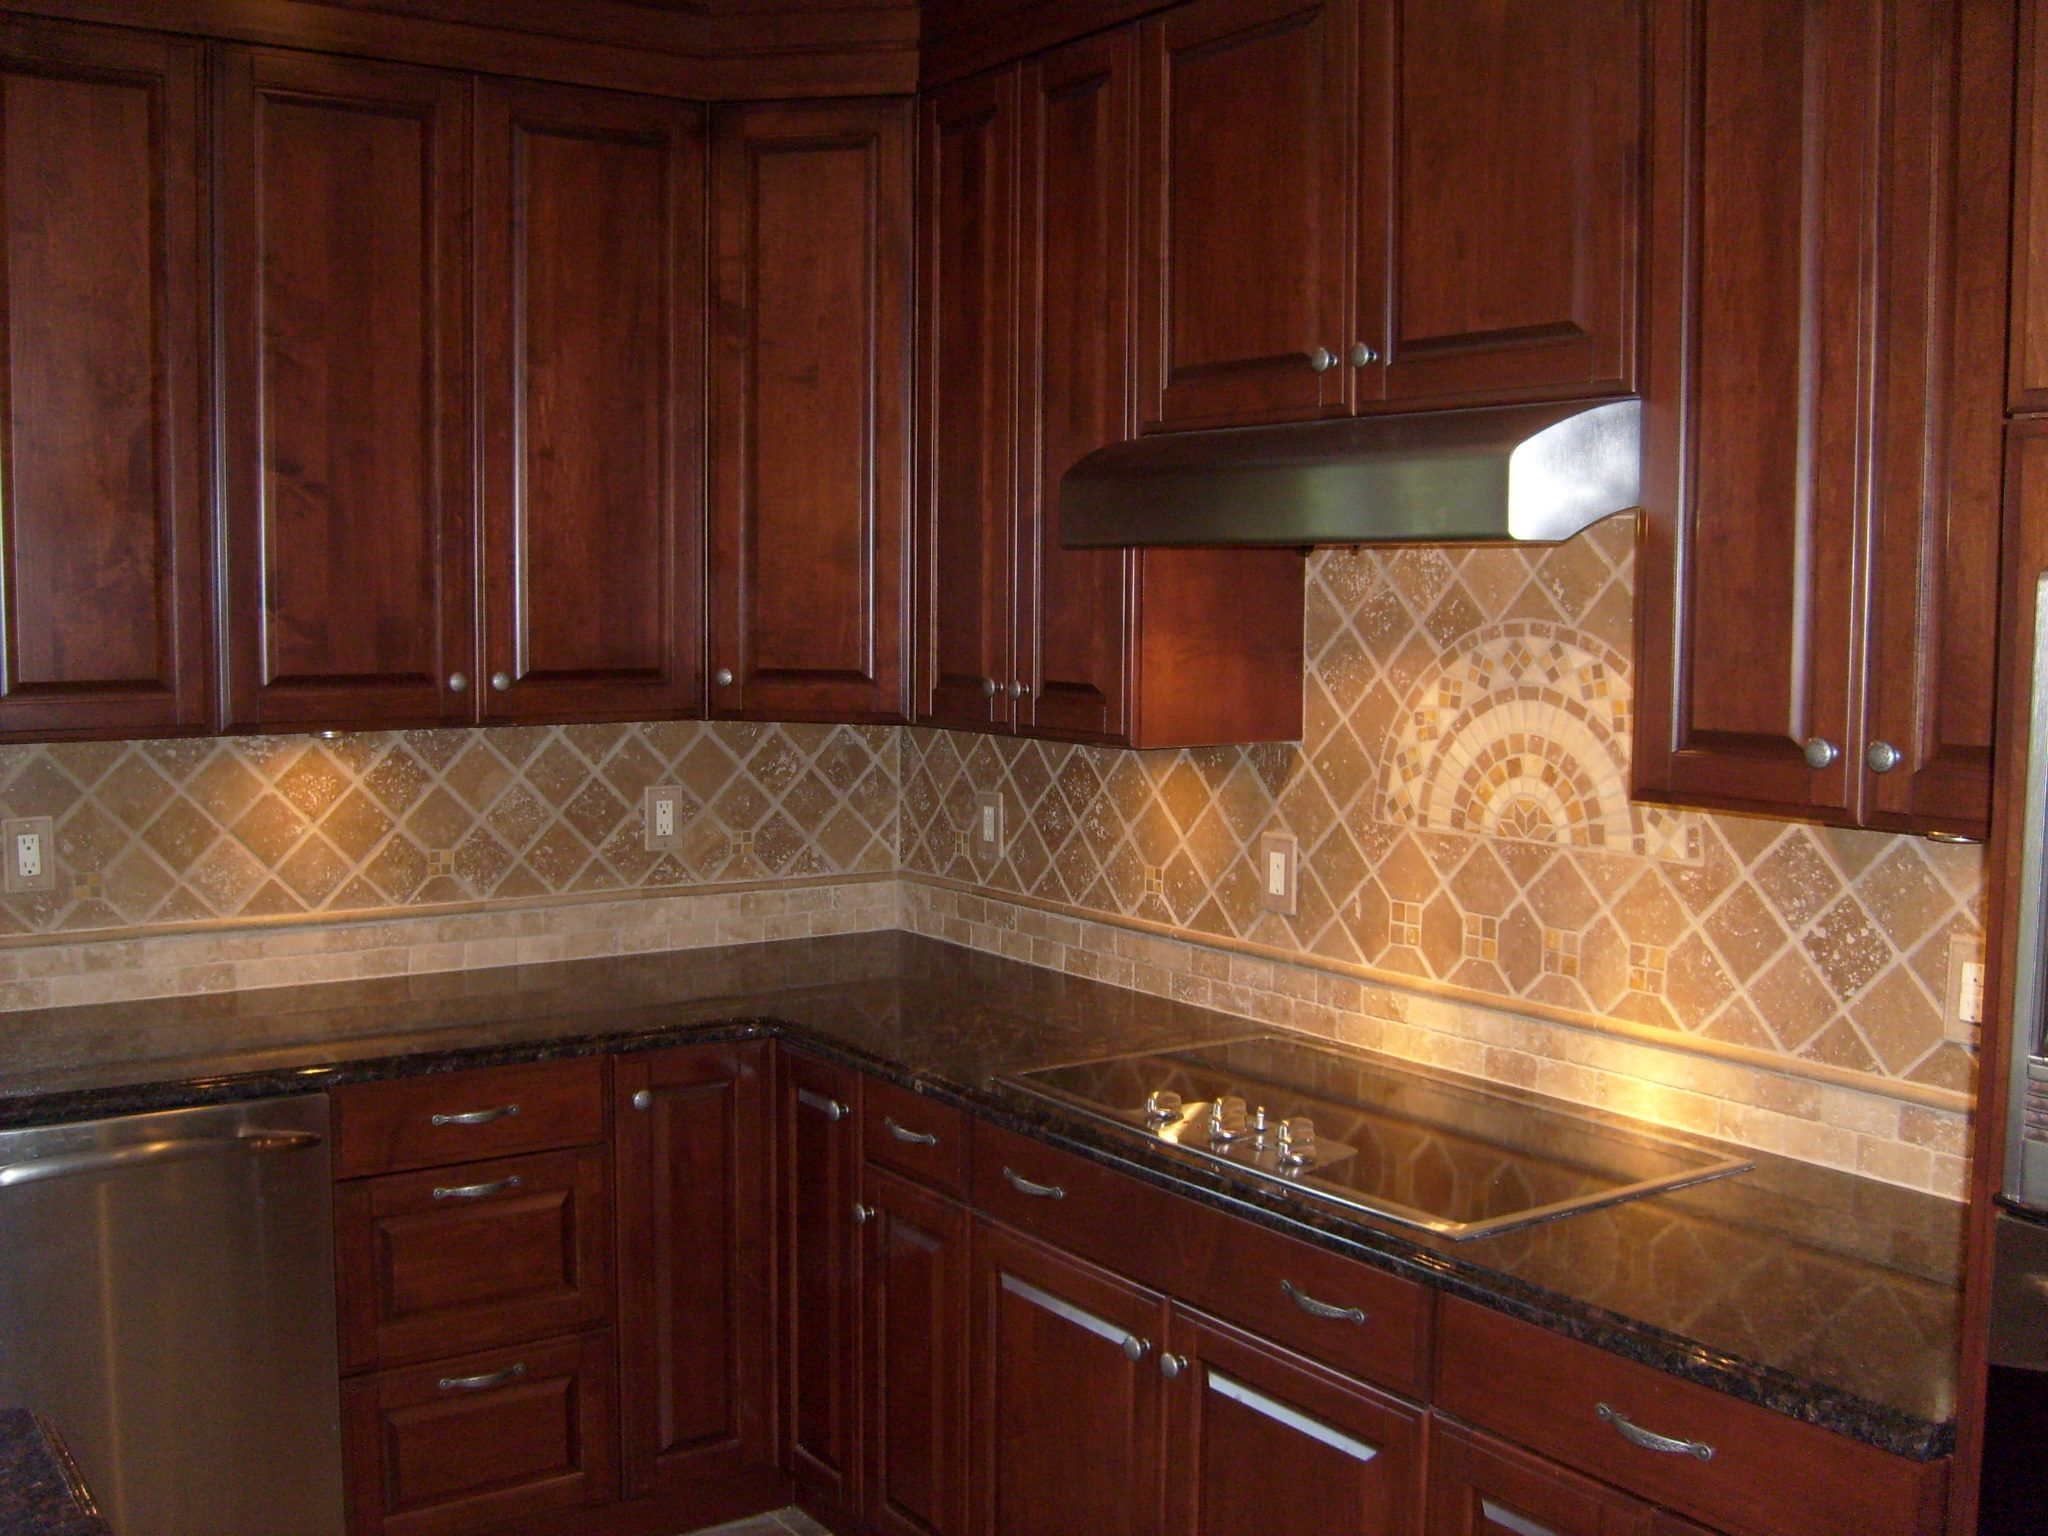 Backsplash Updated Kitchen Kitchen Remodel Kitchen Tiles Backsplash